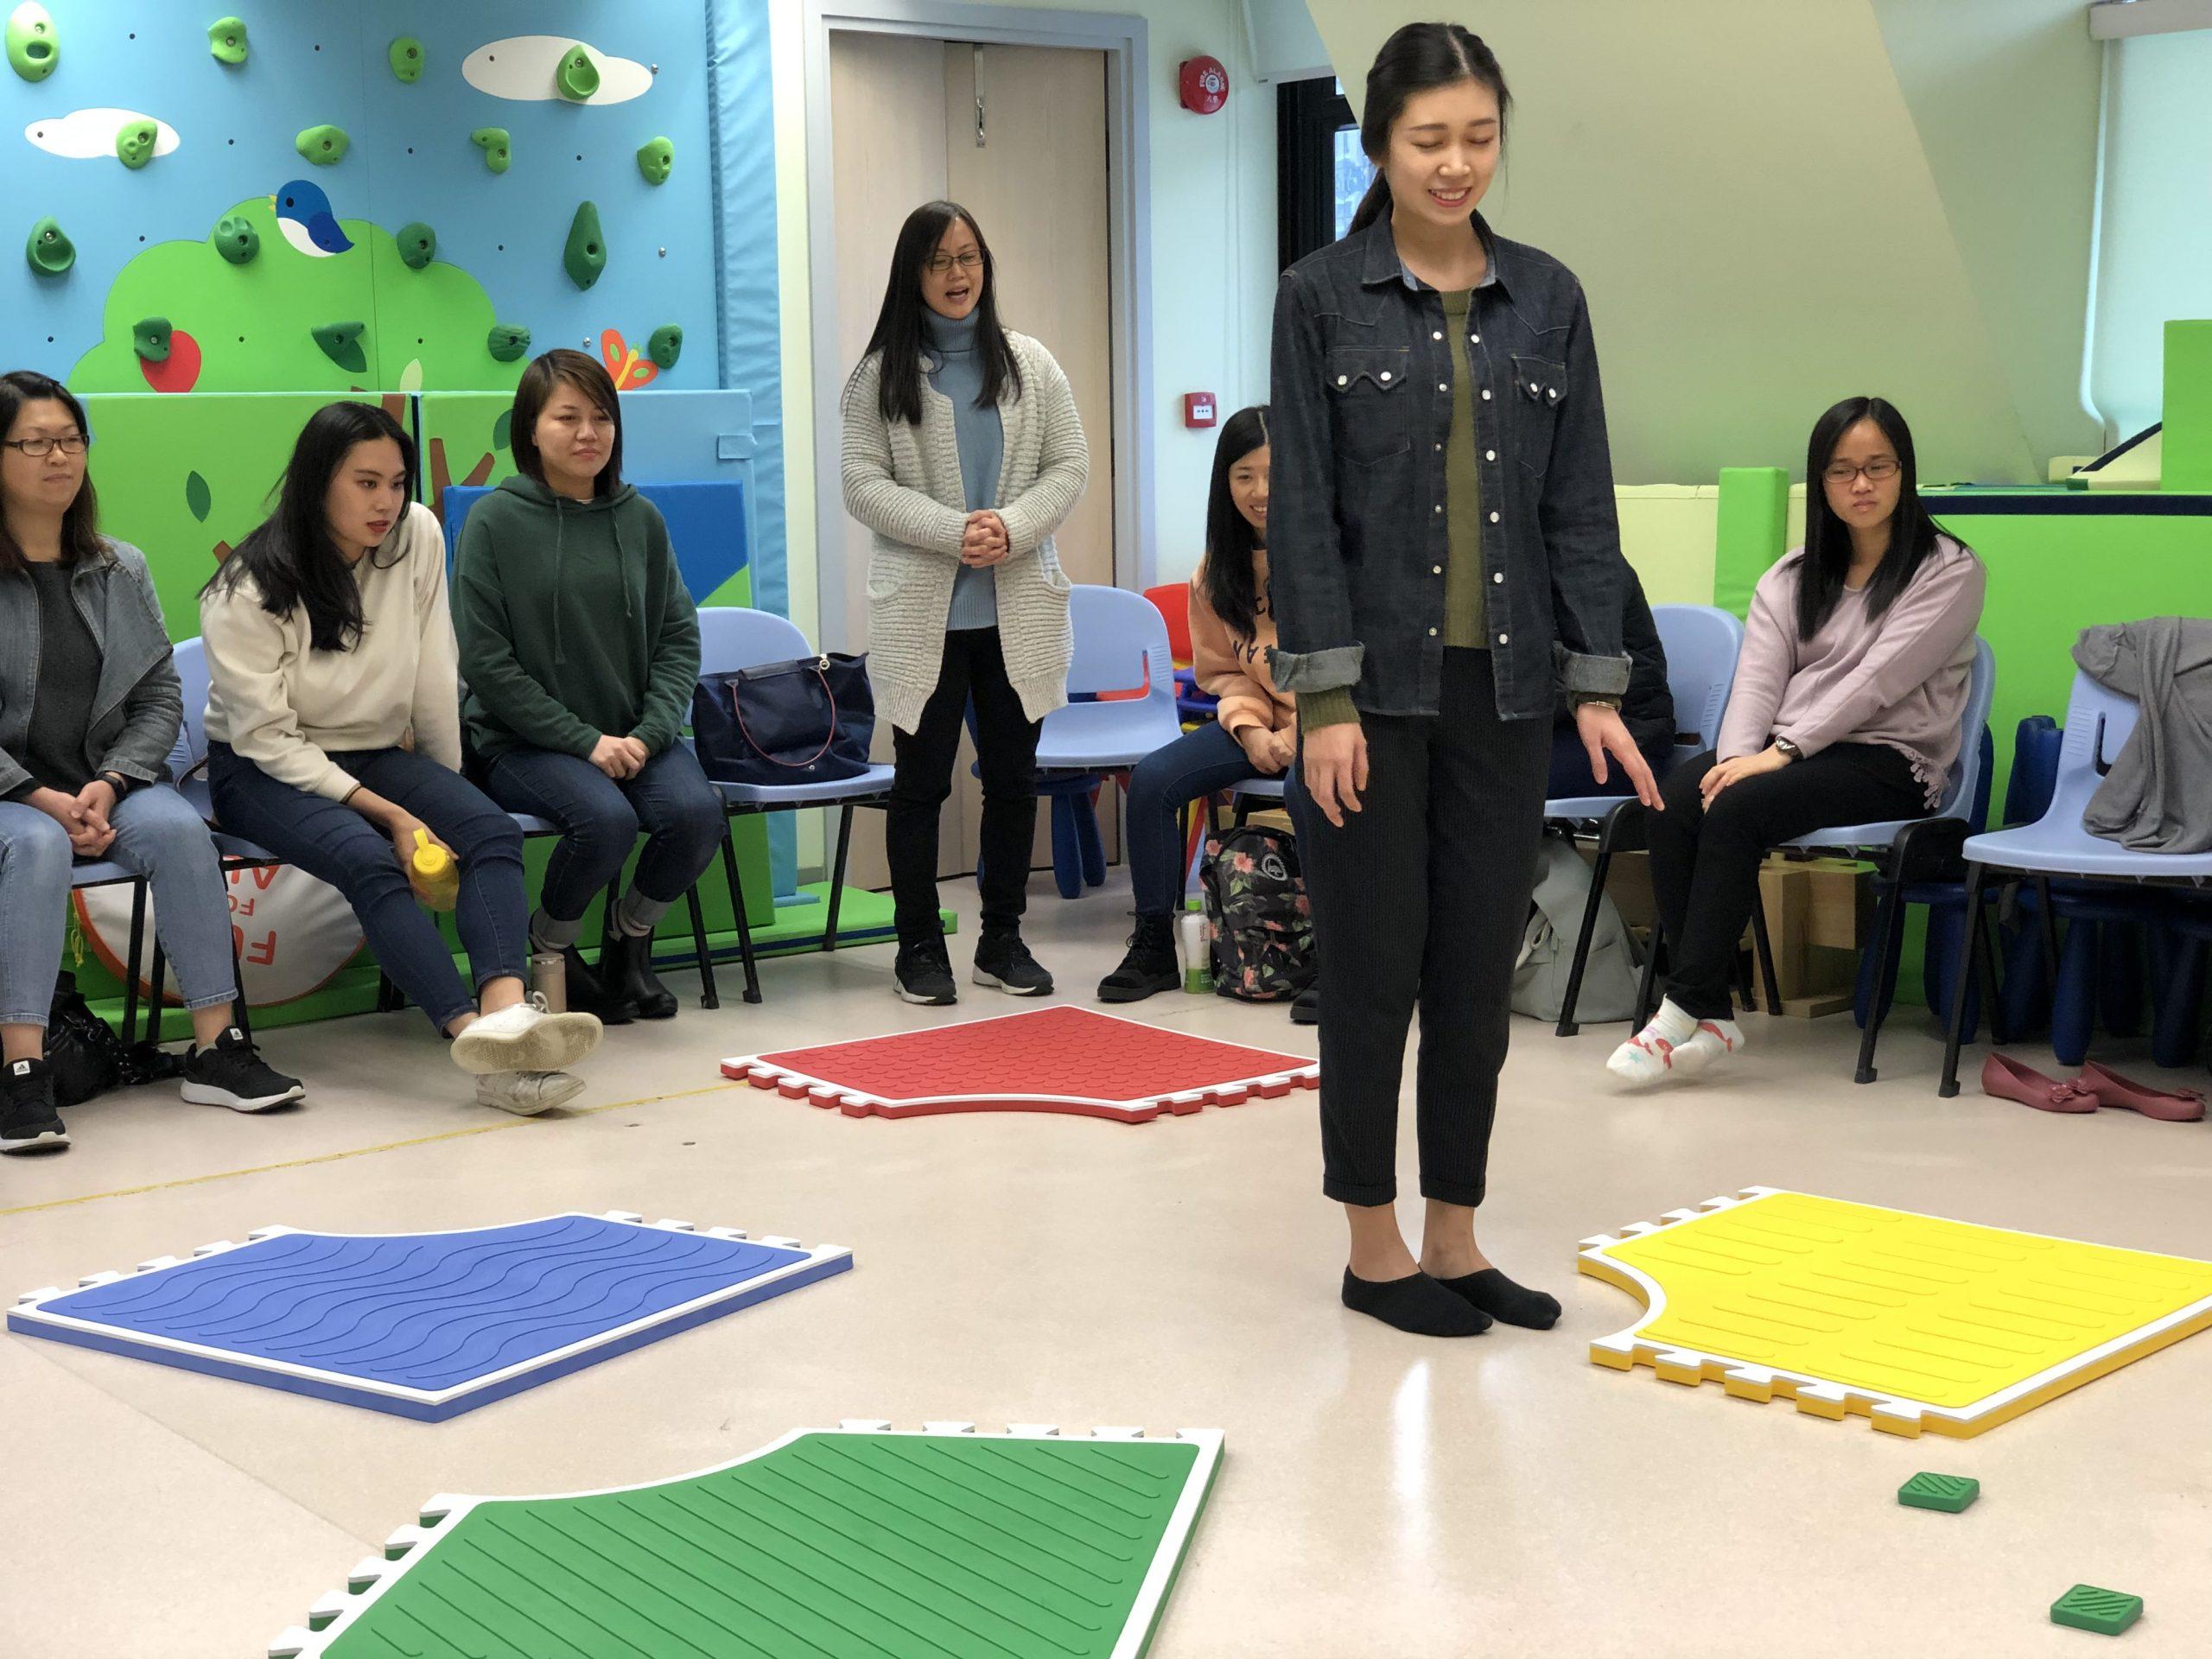 Tung wah teachers receive reach and match training